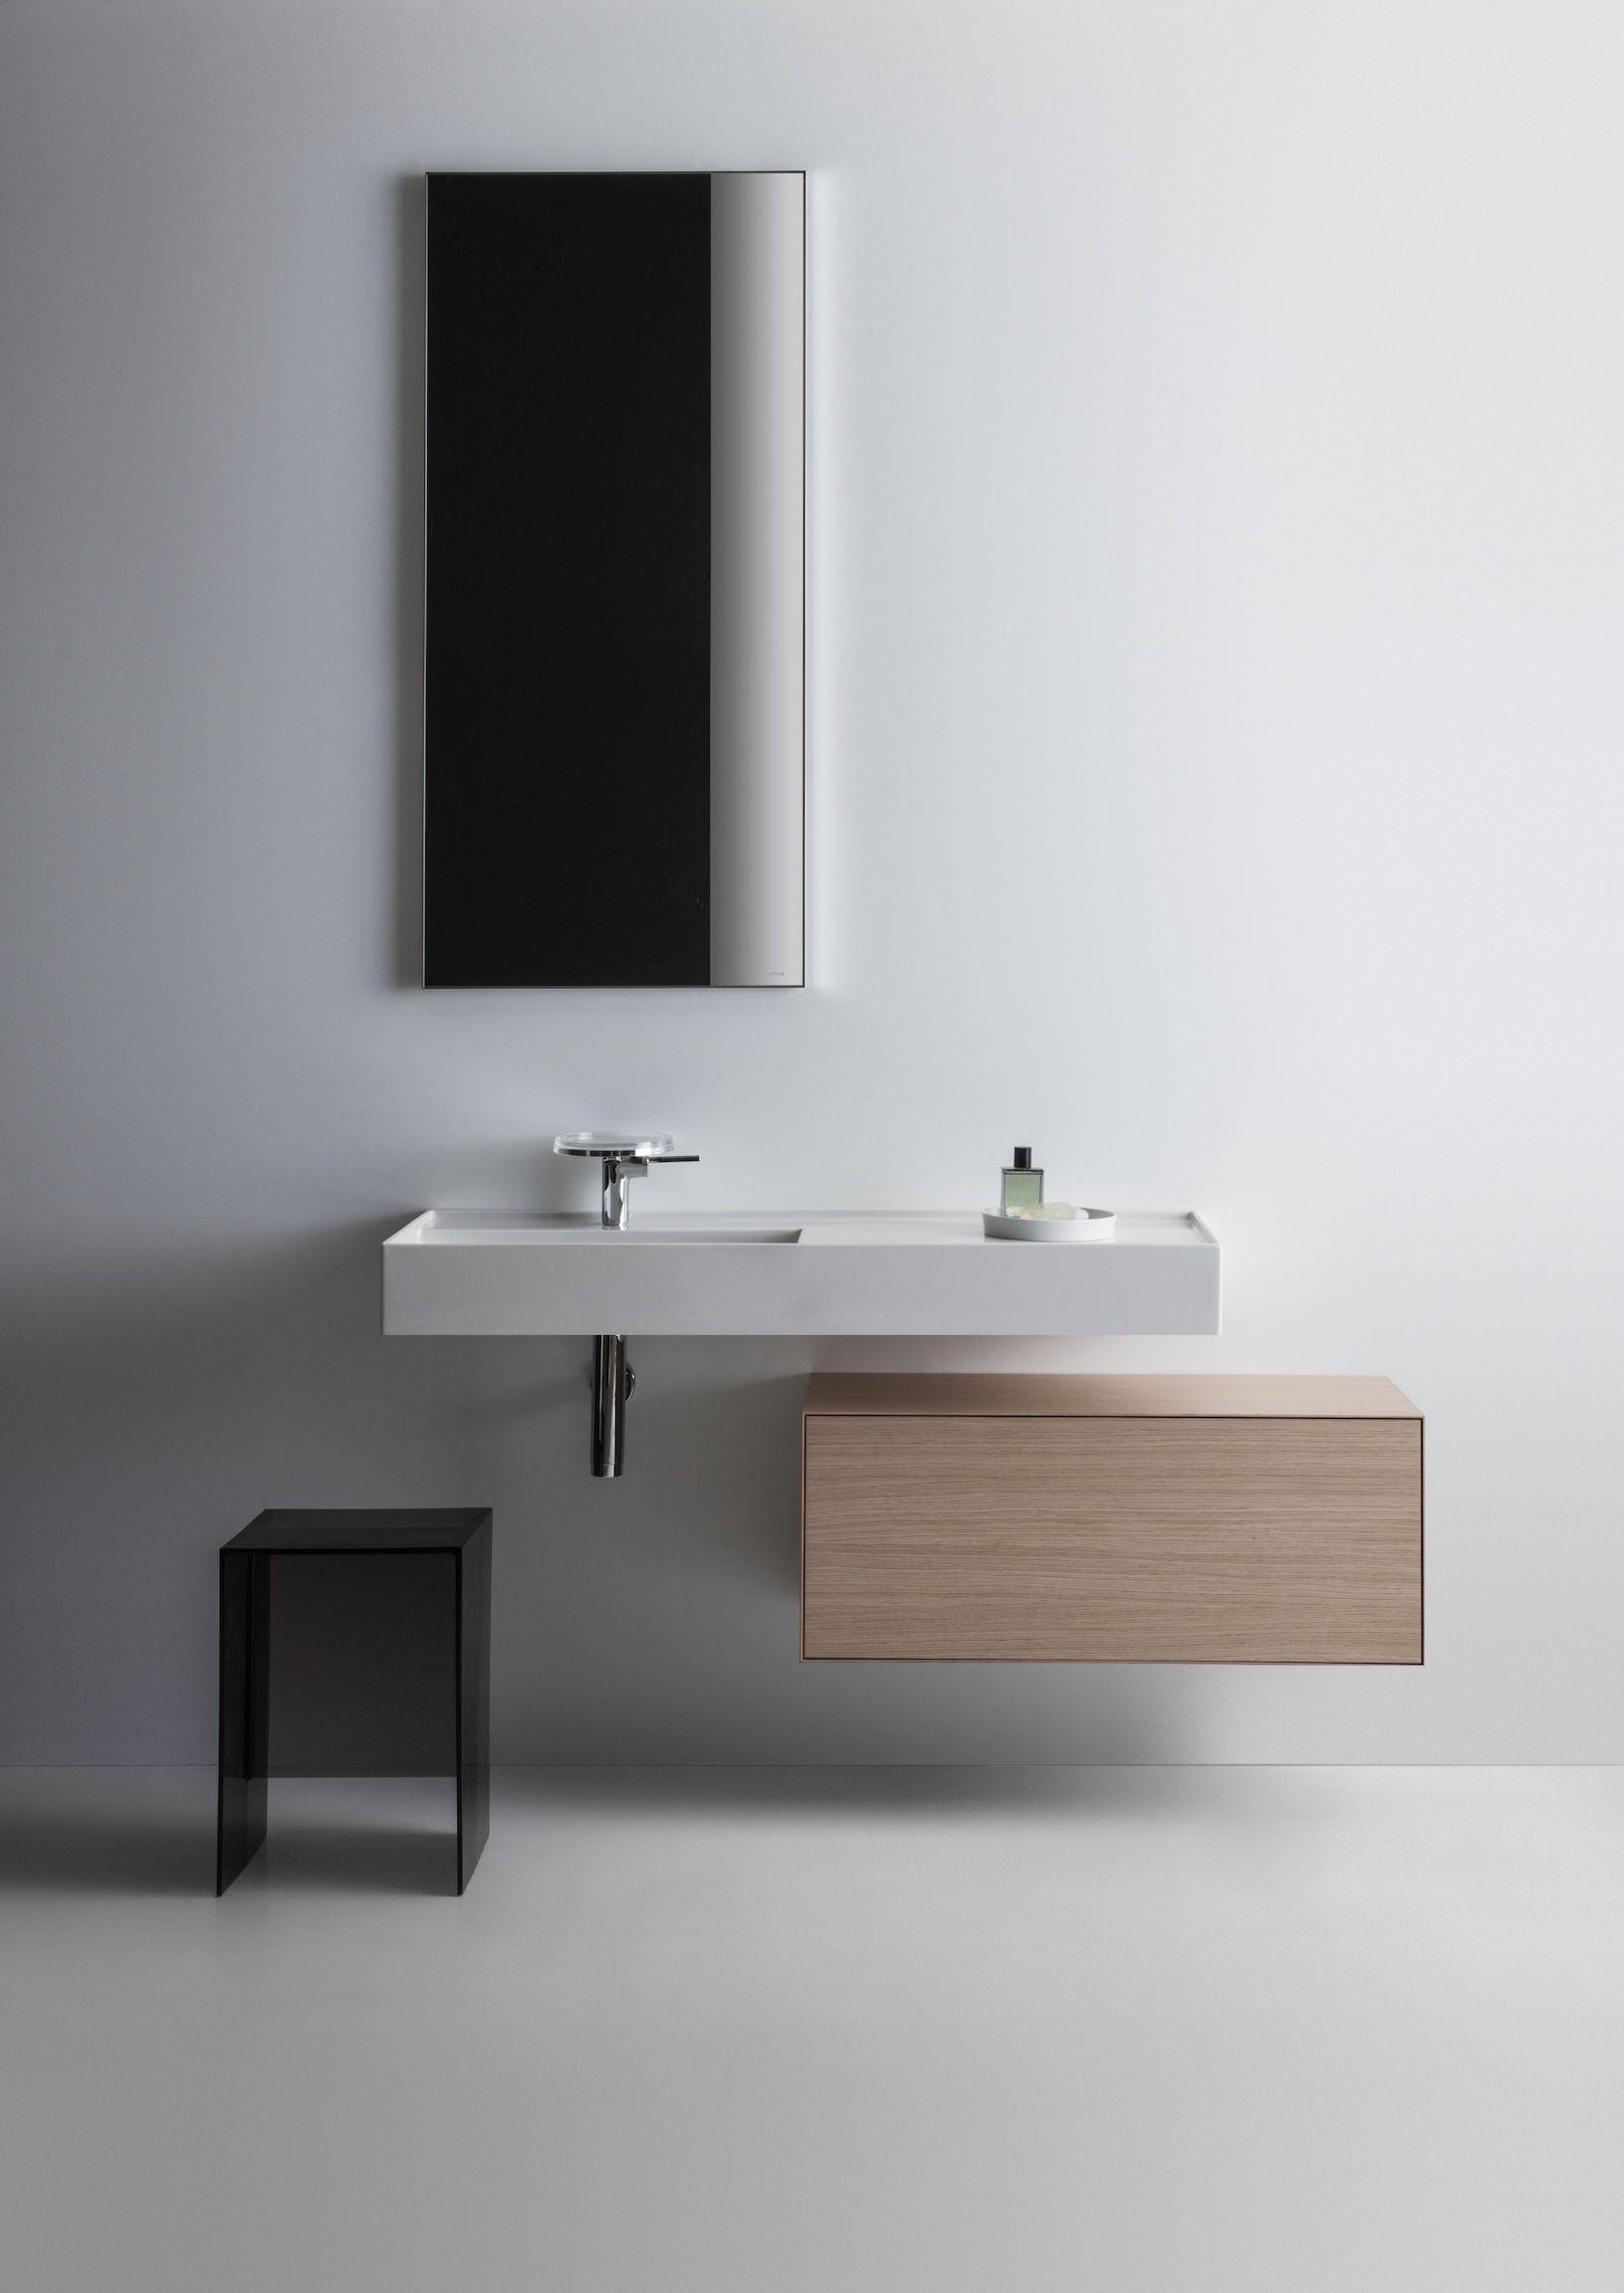 Kartell Laufen Laufen Bathrooms Villa In The Forest In 2019 throughout sizing 1631 X 2303